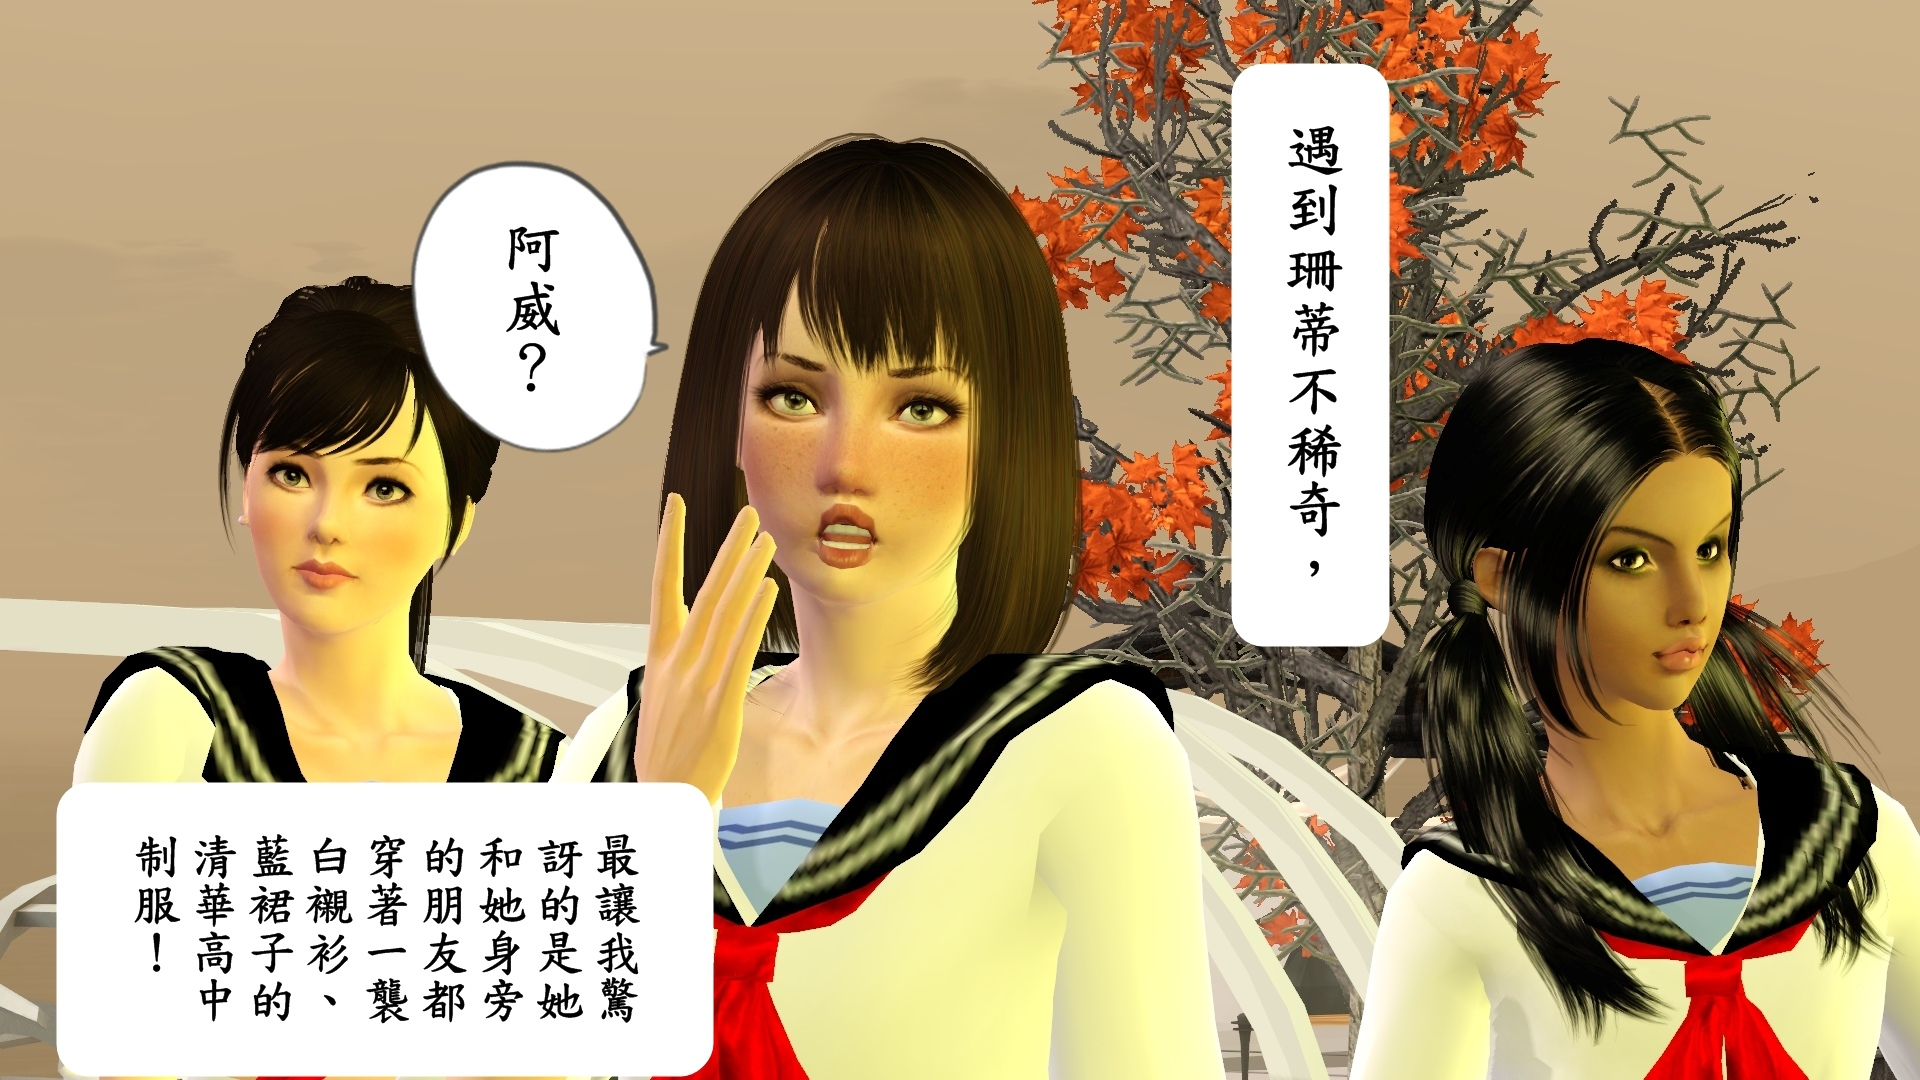 B05阿威? 遇到Sandy不稀奇,最讓我驚訝的是她和她身旁的朋友都穿著一襲白襯衫、藍裙子的 A 高制服!.jpg